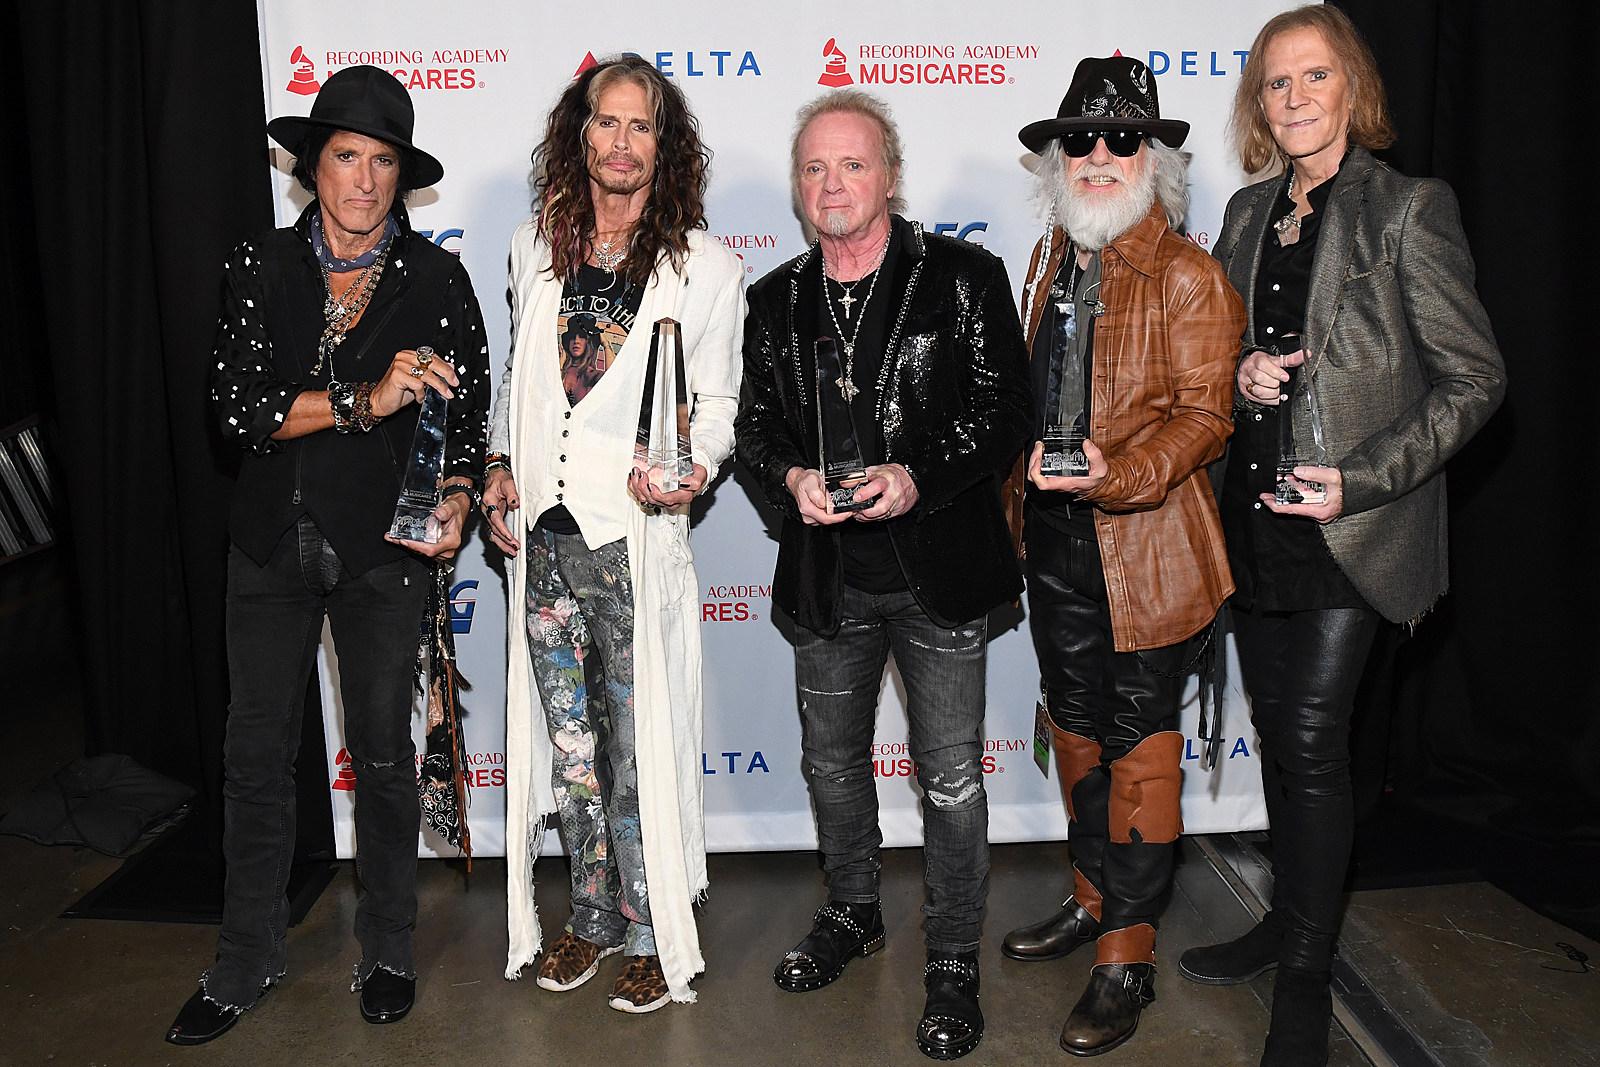 Joey Kramer Shares Podium, Not Stage With Aerosmith at MusiCares